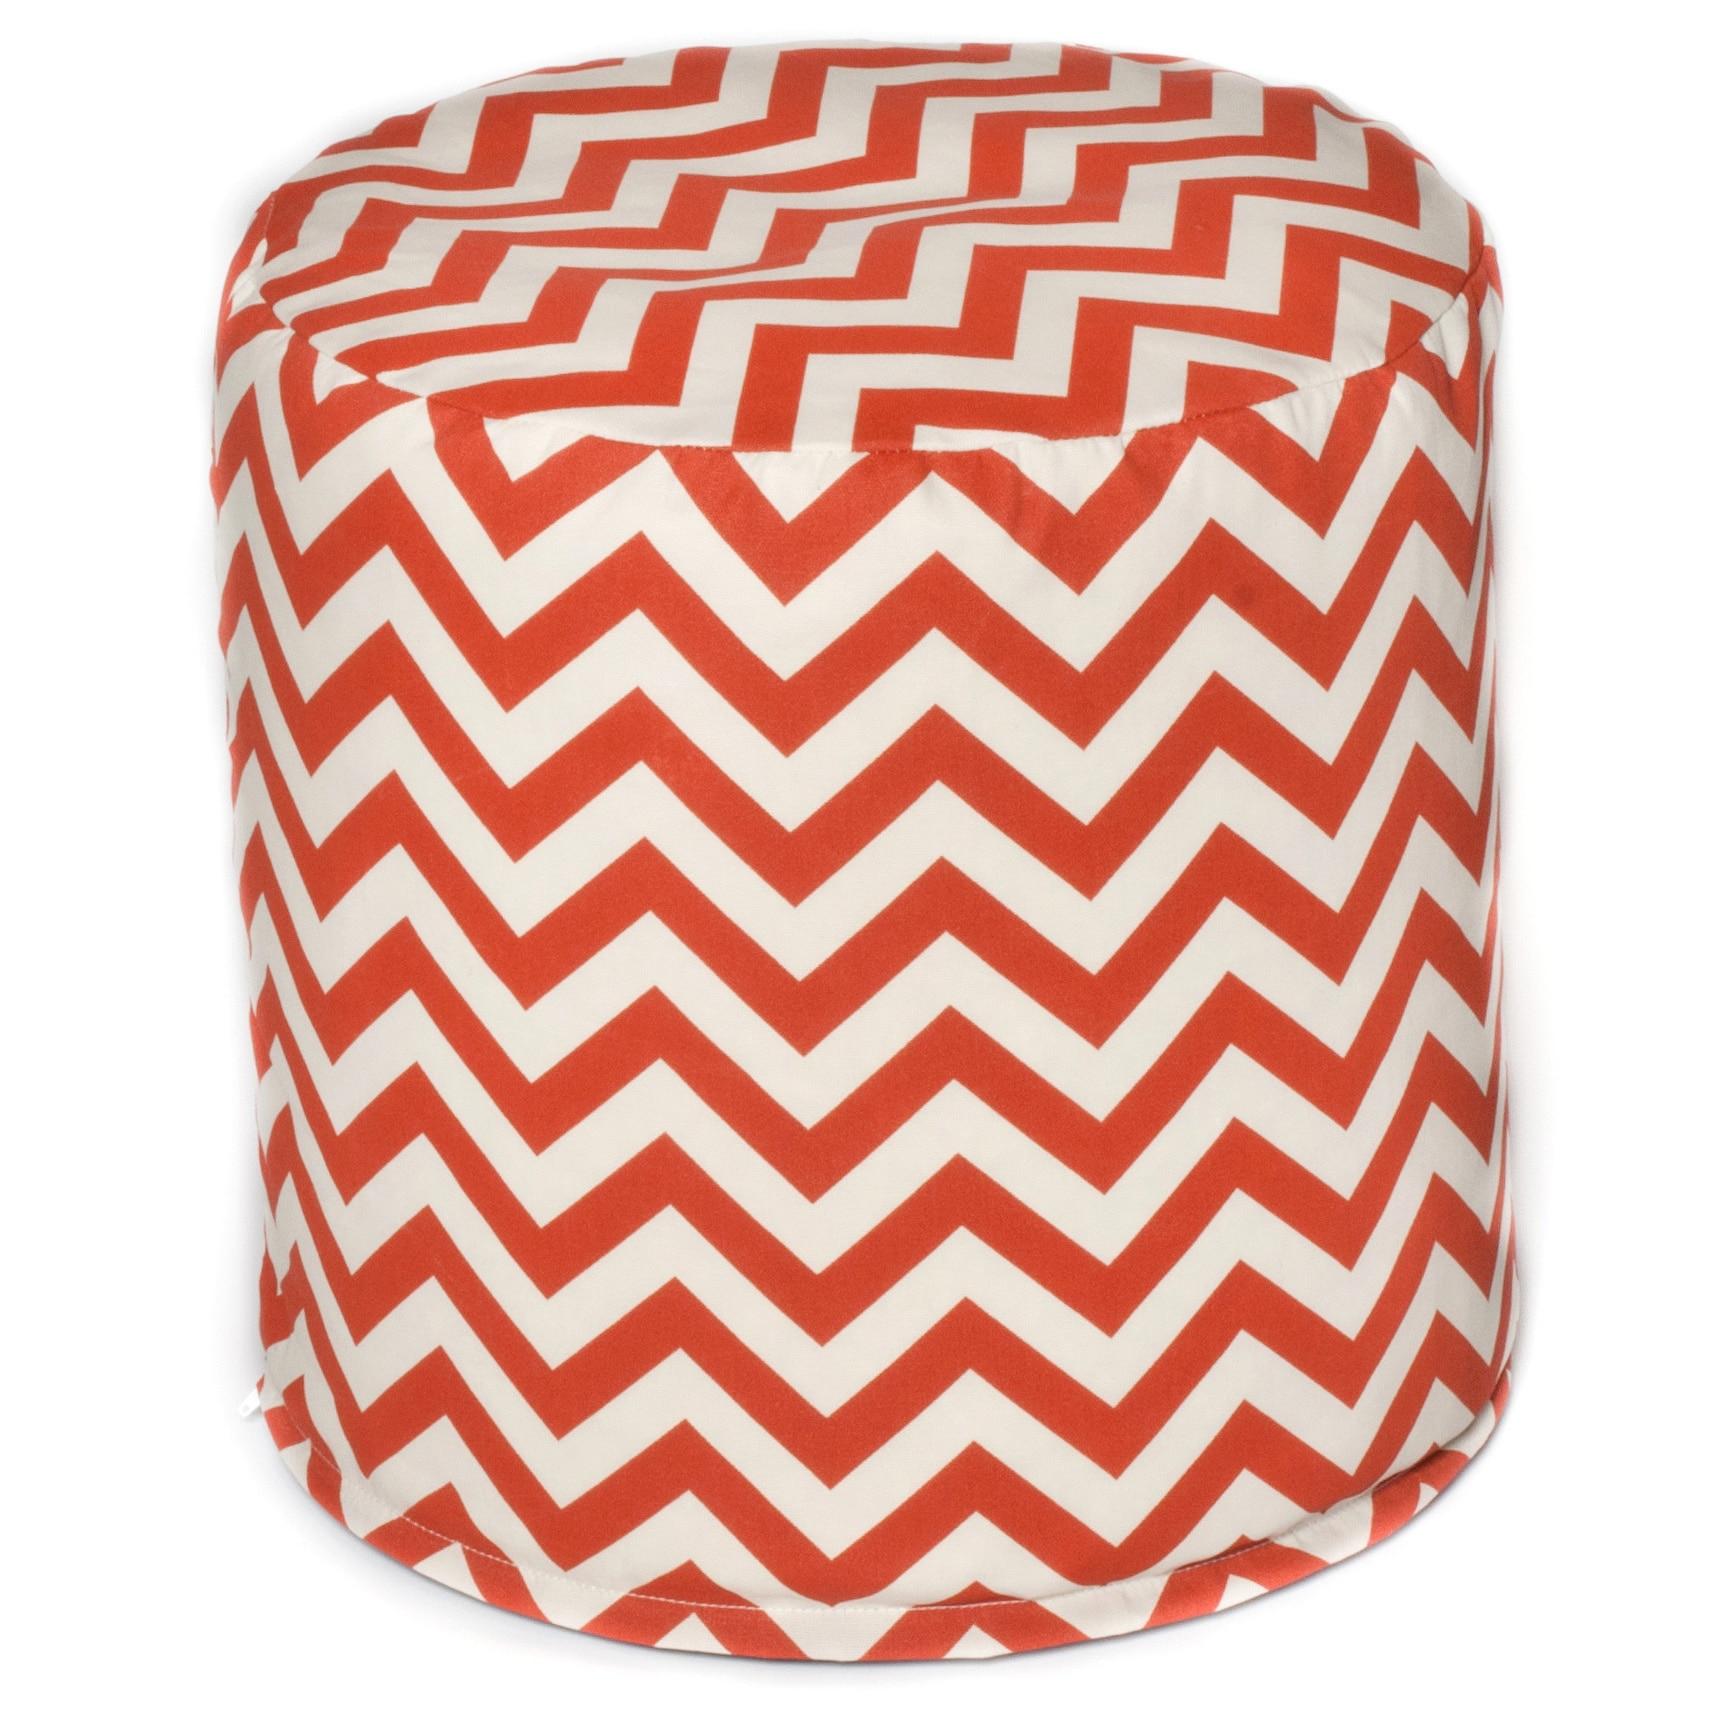 Sensational Chateau Designs Outdoor Beanbag Cylinder Inzonedesignstudio Interior Chair Design Inzonedesignstudiocom